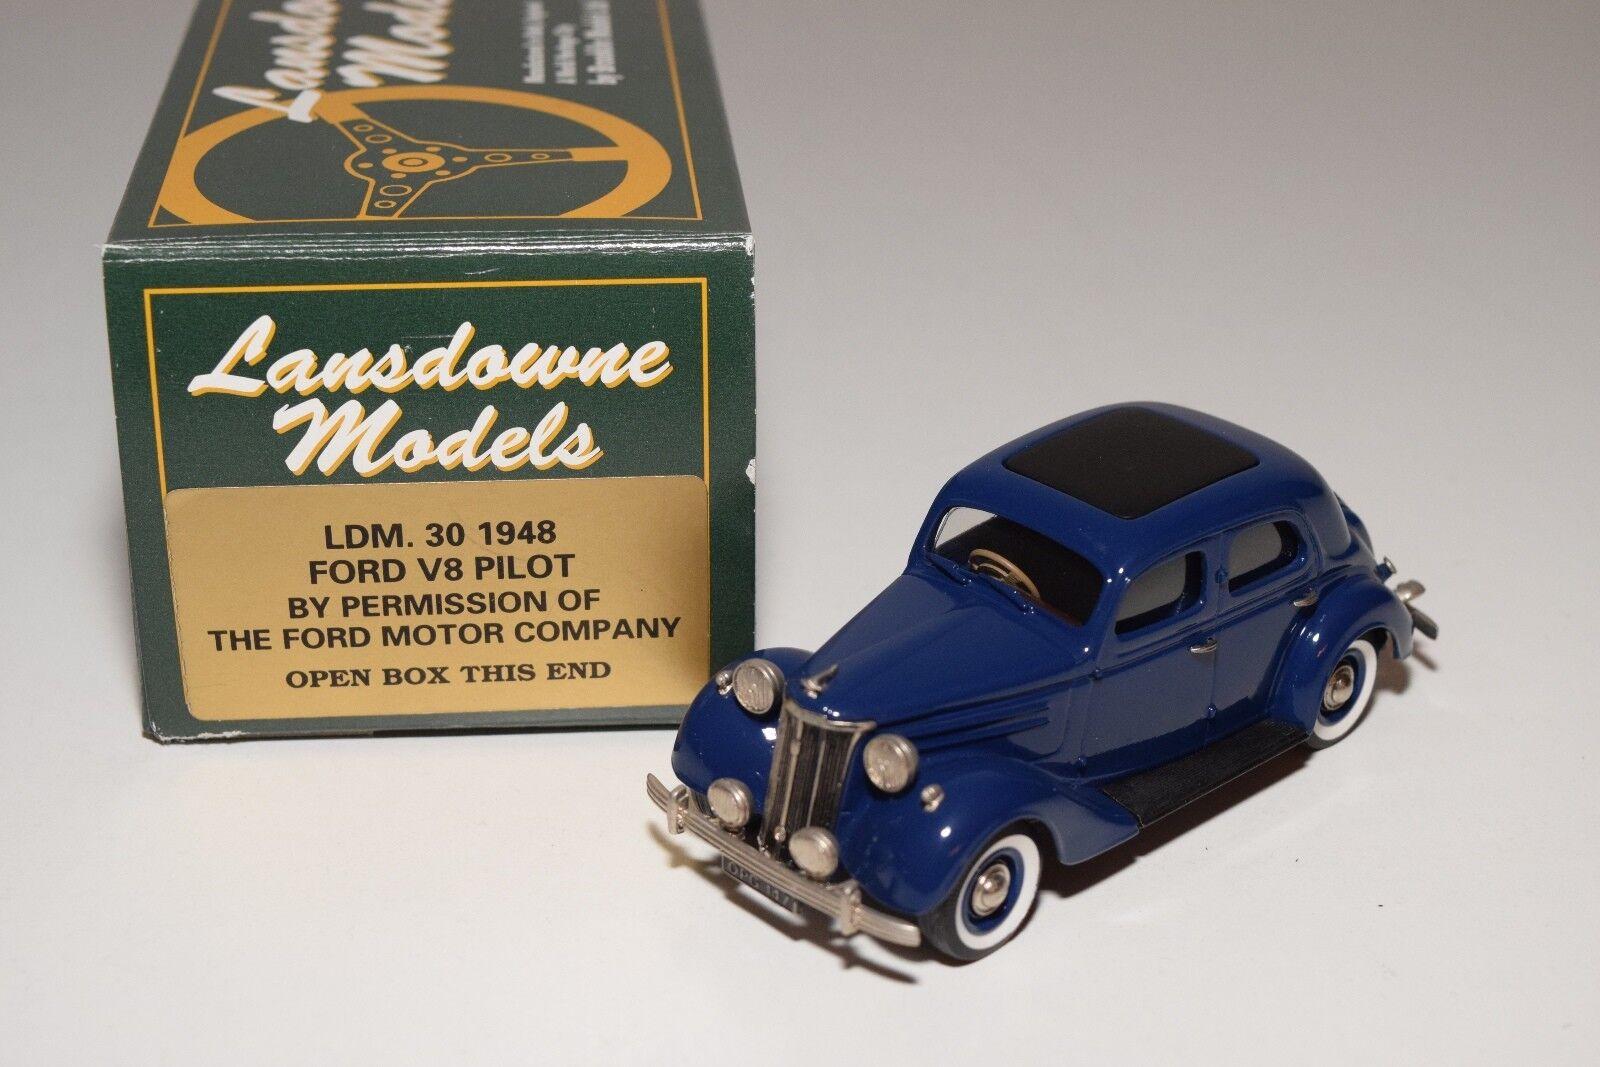 LANSDOWNE MODELS LDM 30 1948 FORD V8 PILOT azul MINT BOXED